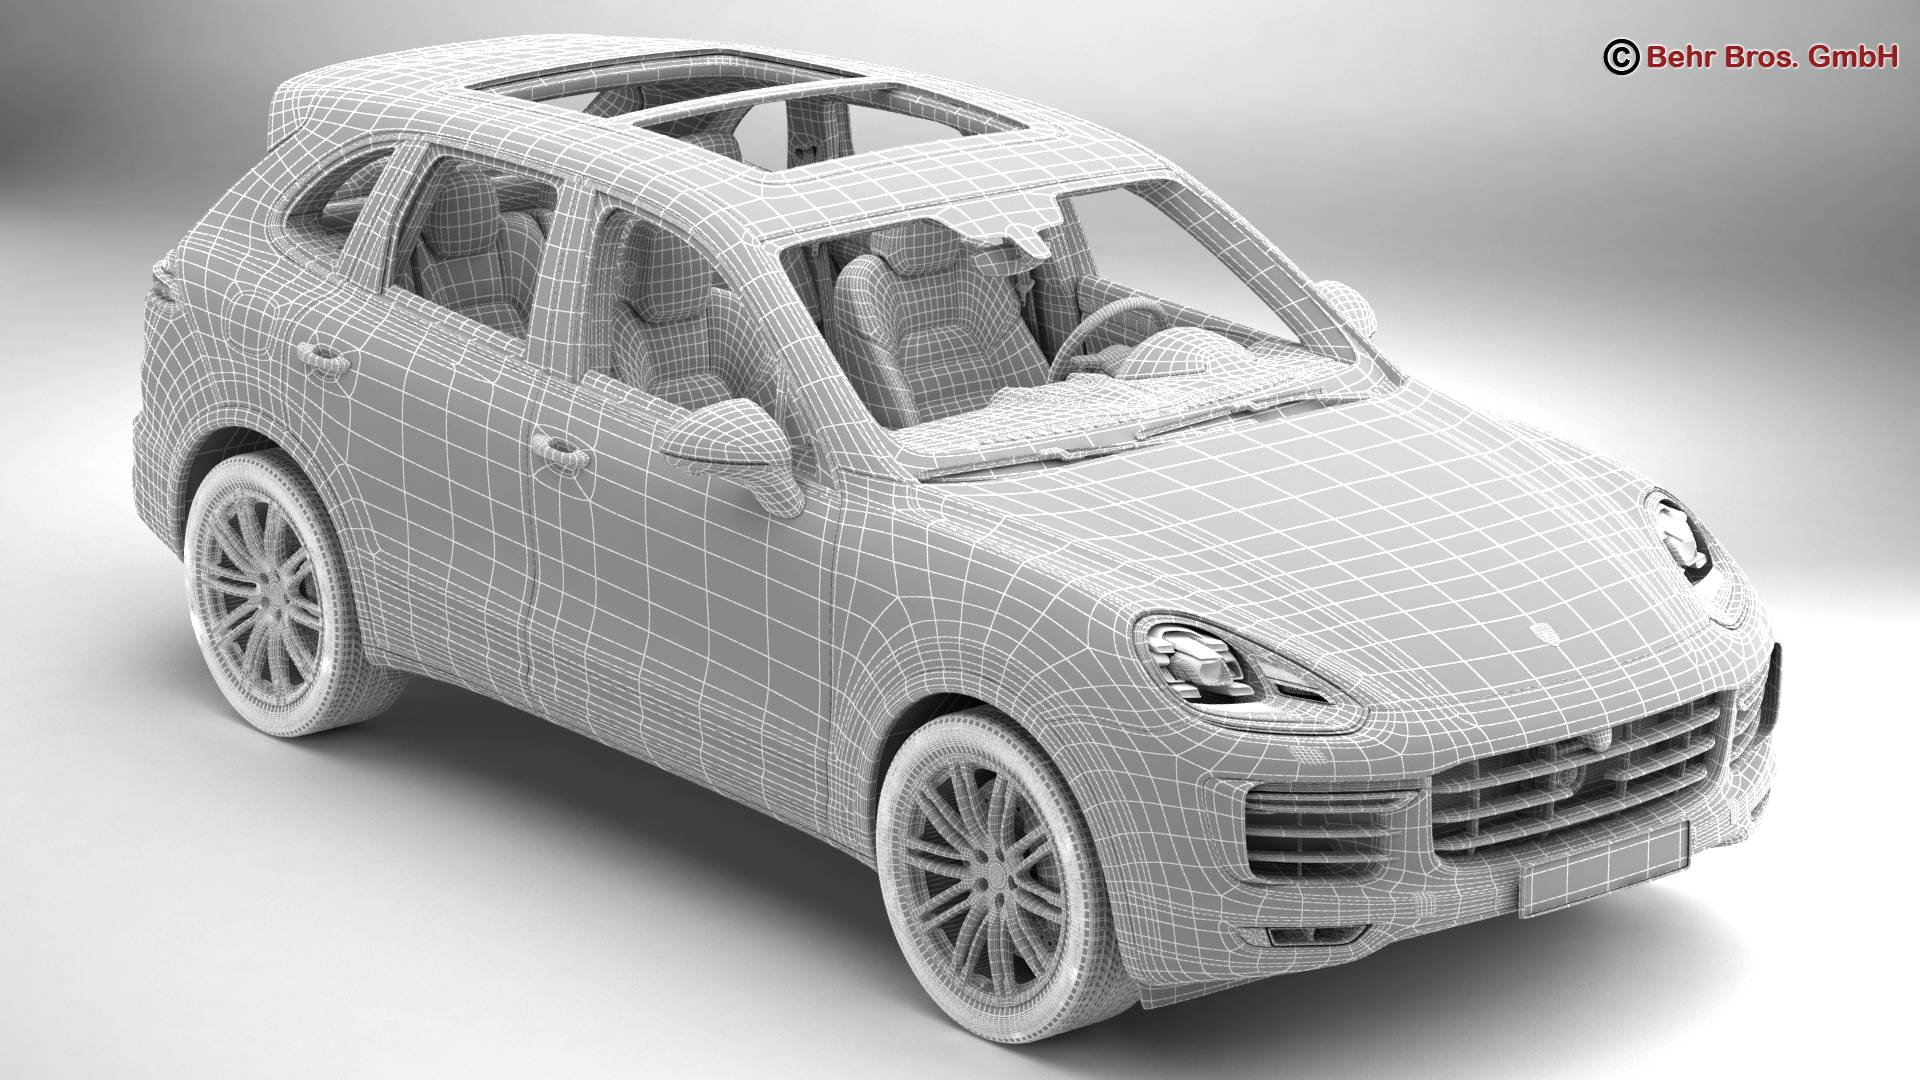 porsche cayenne turbo s 2016 3d model 3ds max fbx c4d lwo ma mb obj 214941